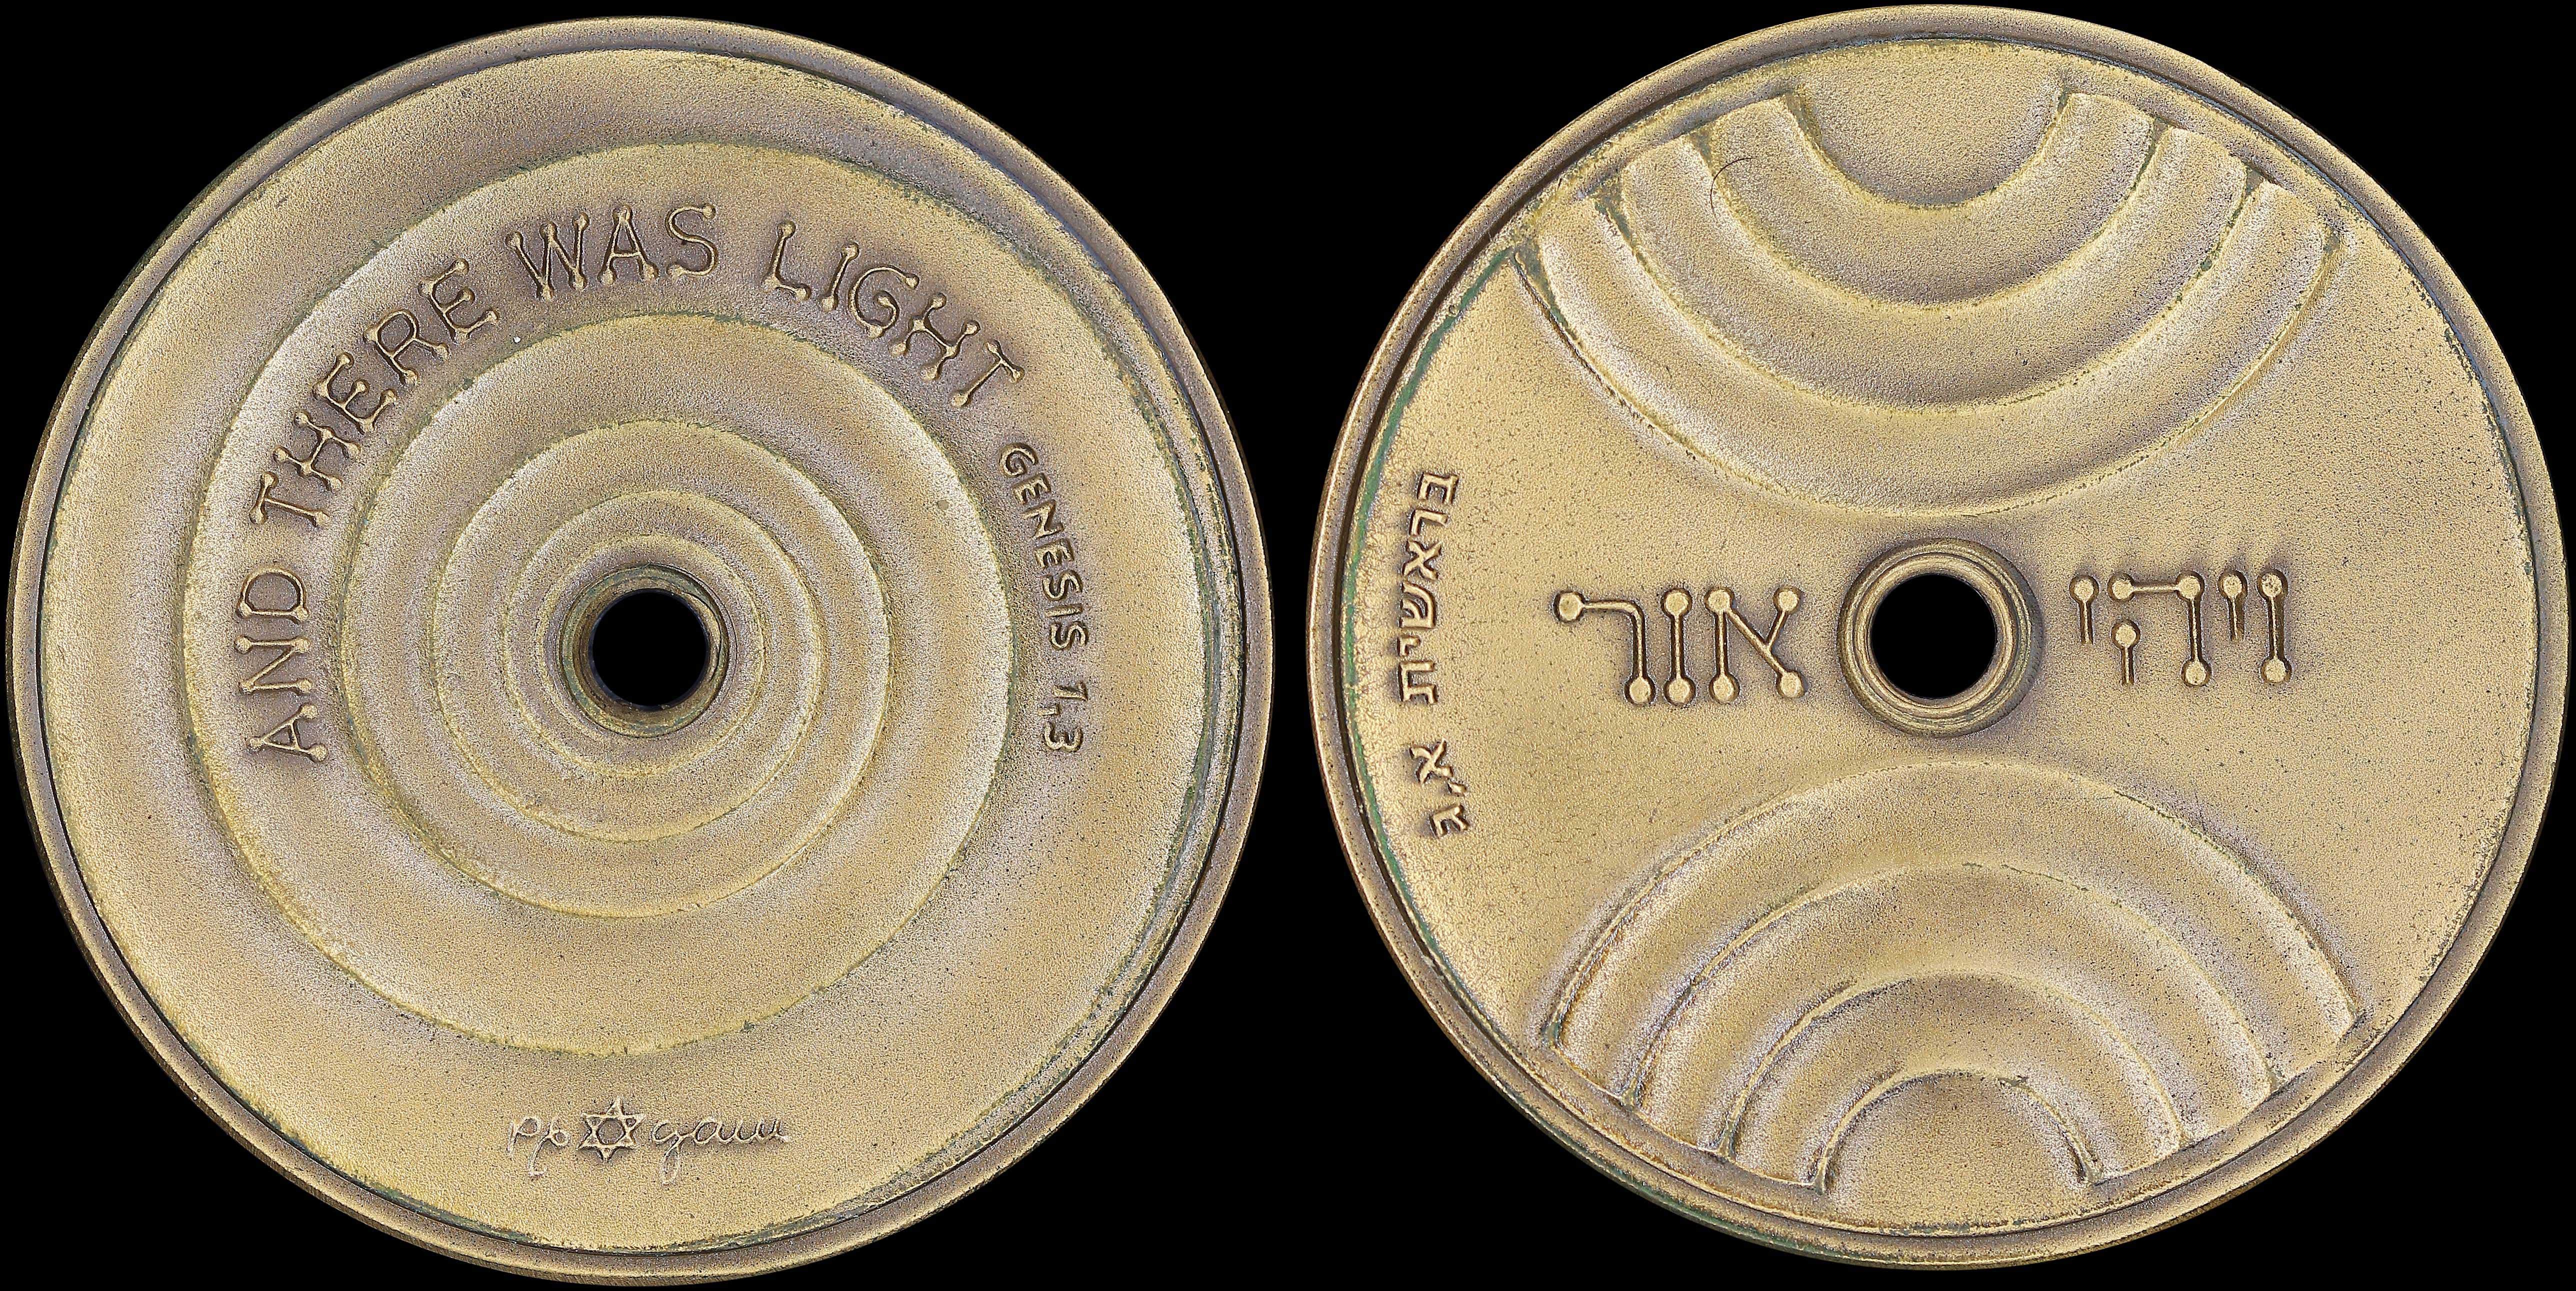 Lot 7365 - -  MEDALS & DECORATIONS FOREIGN MEDALS & DECORATIONS -  A. Karamitsos Public & Live Internet Auction 682 (Part B) Coins, Medals & Banknotes